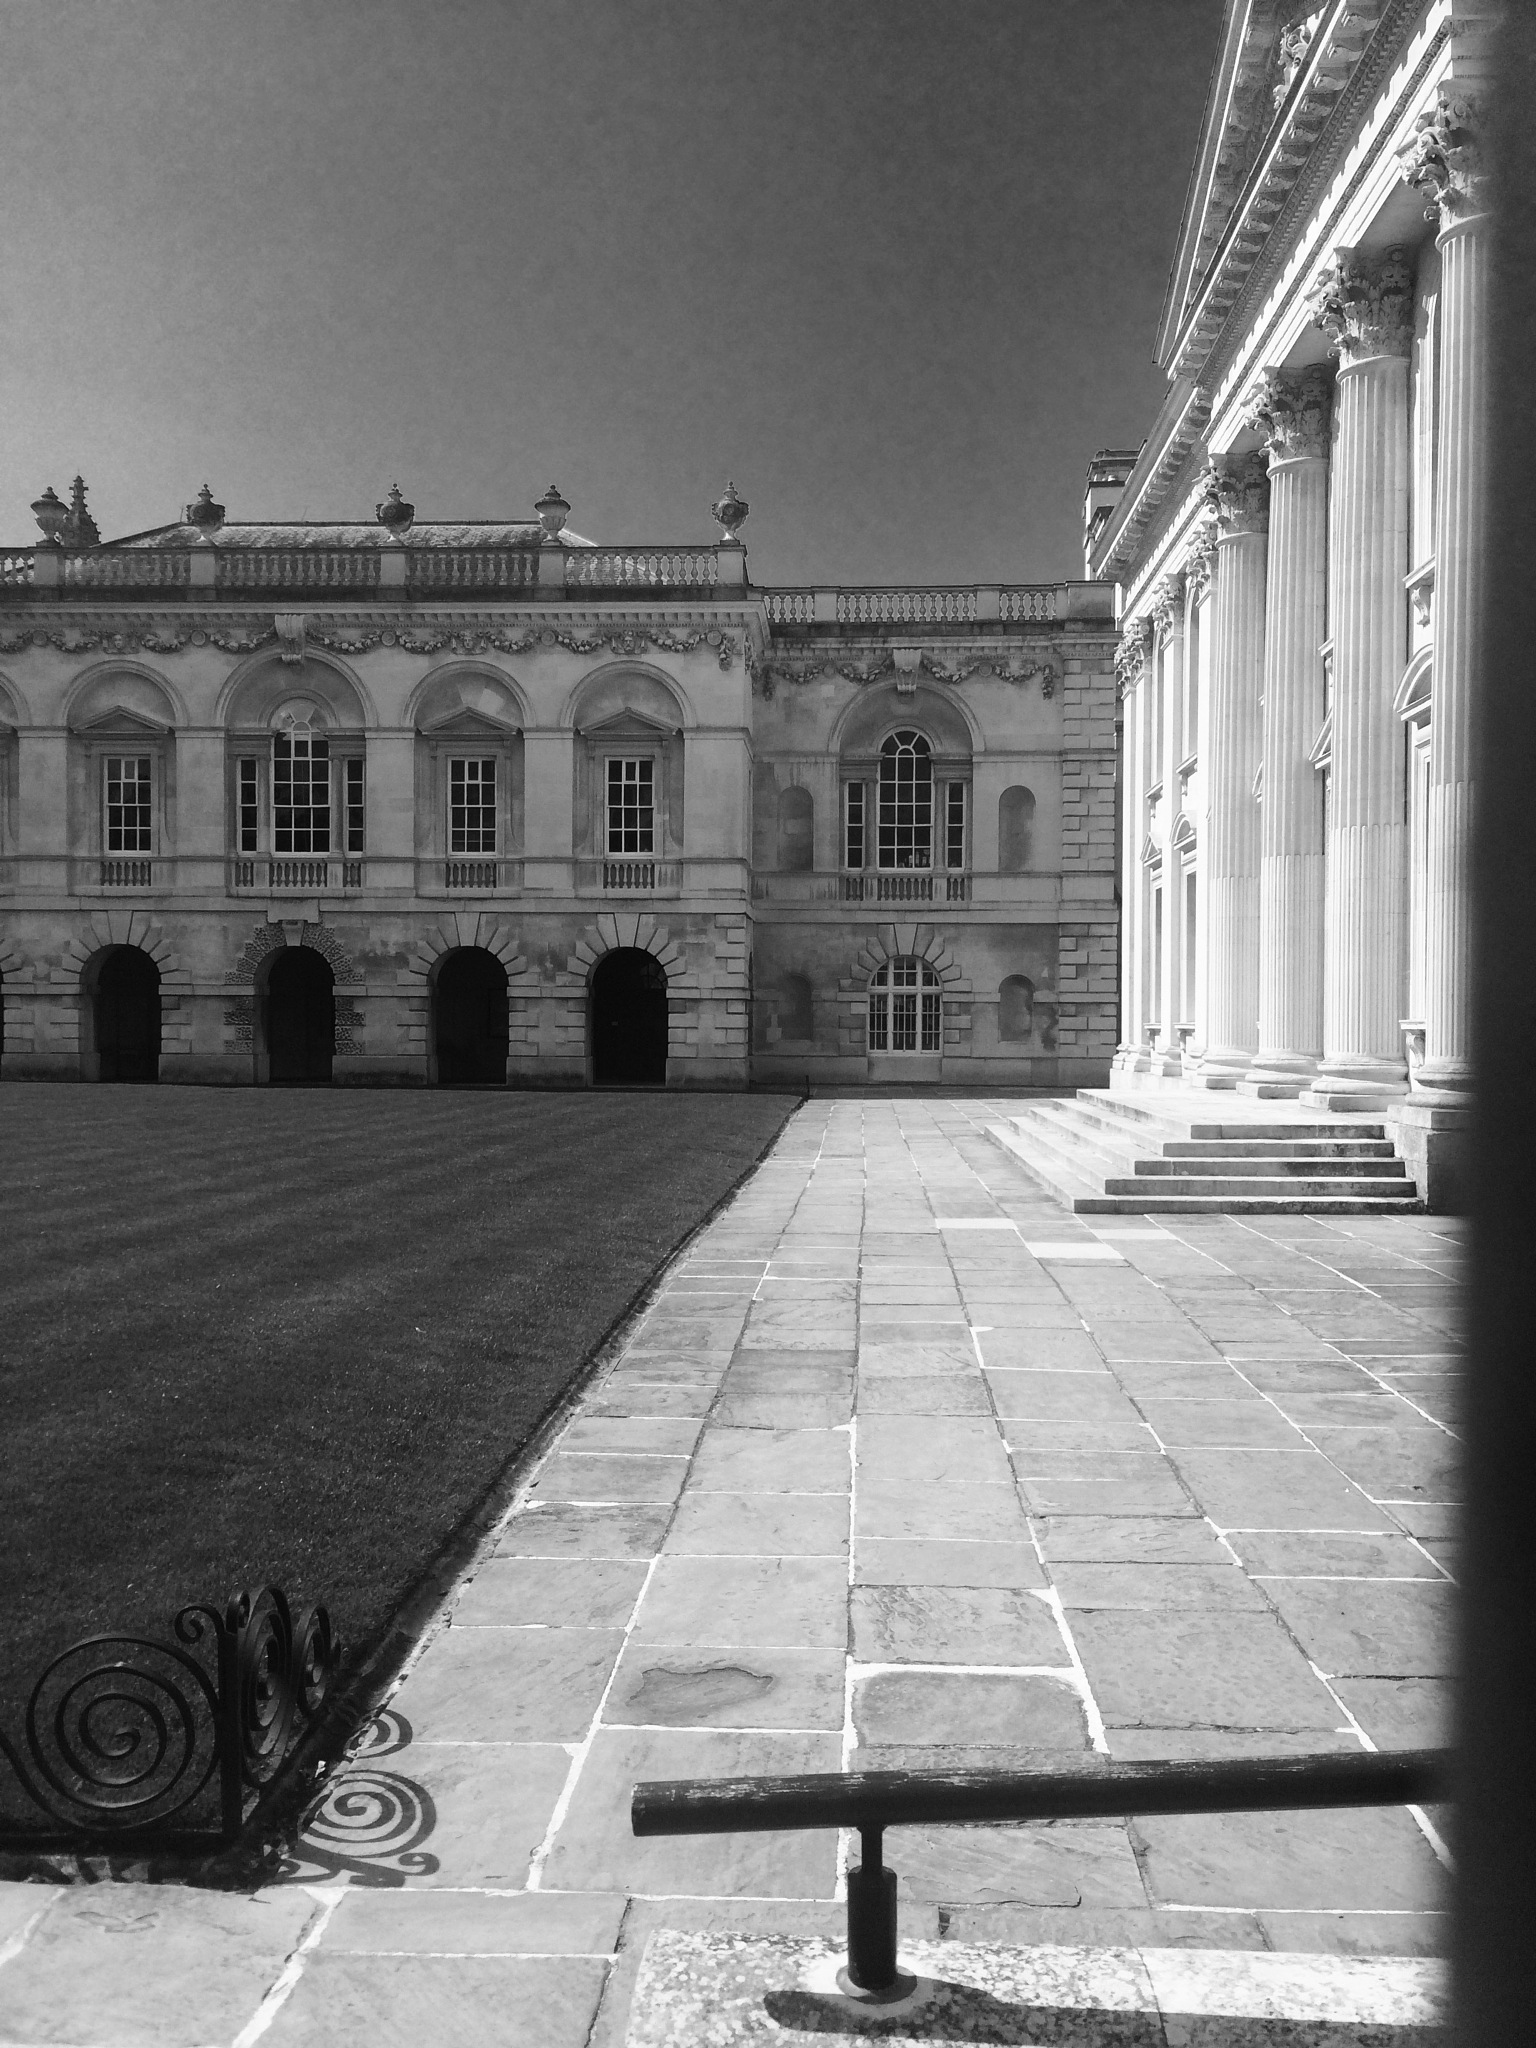 Kings College by Ian Haygreen